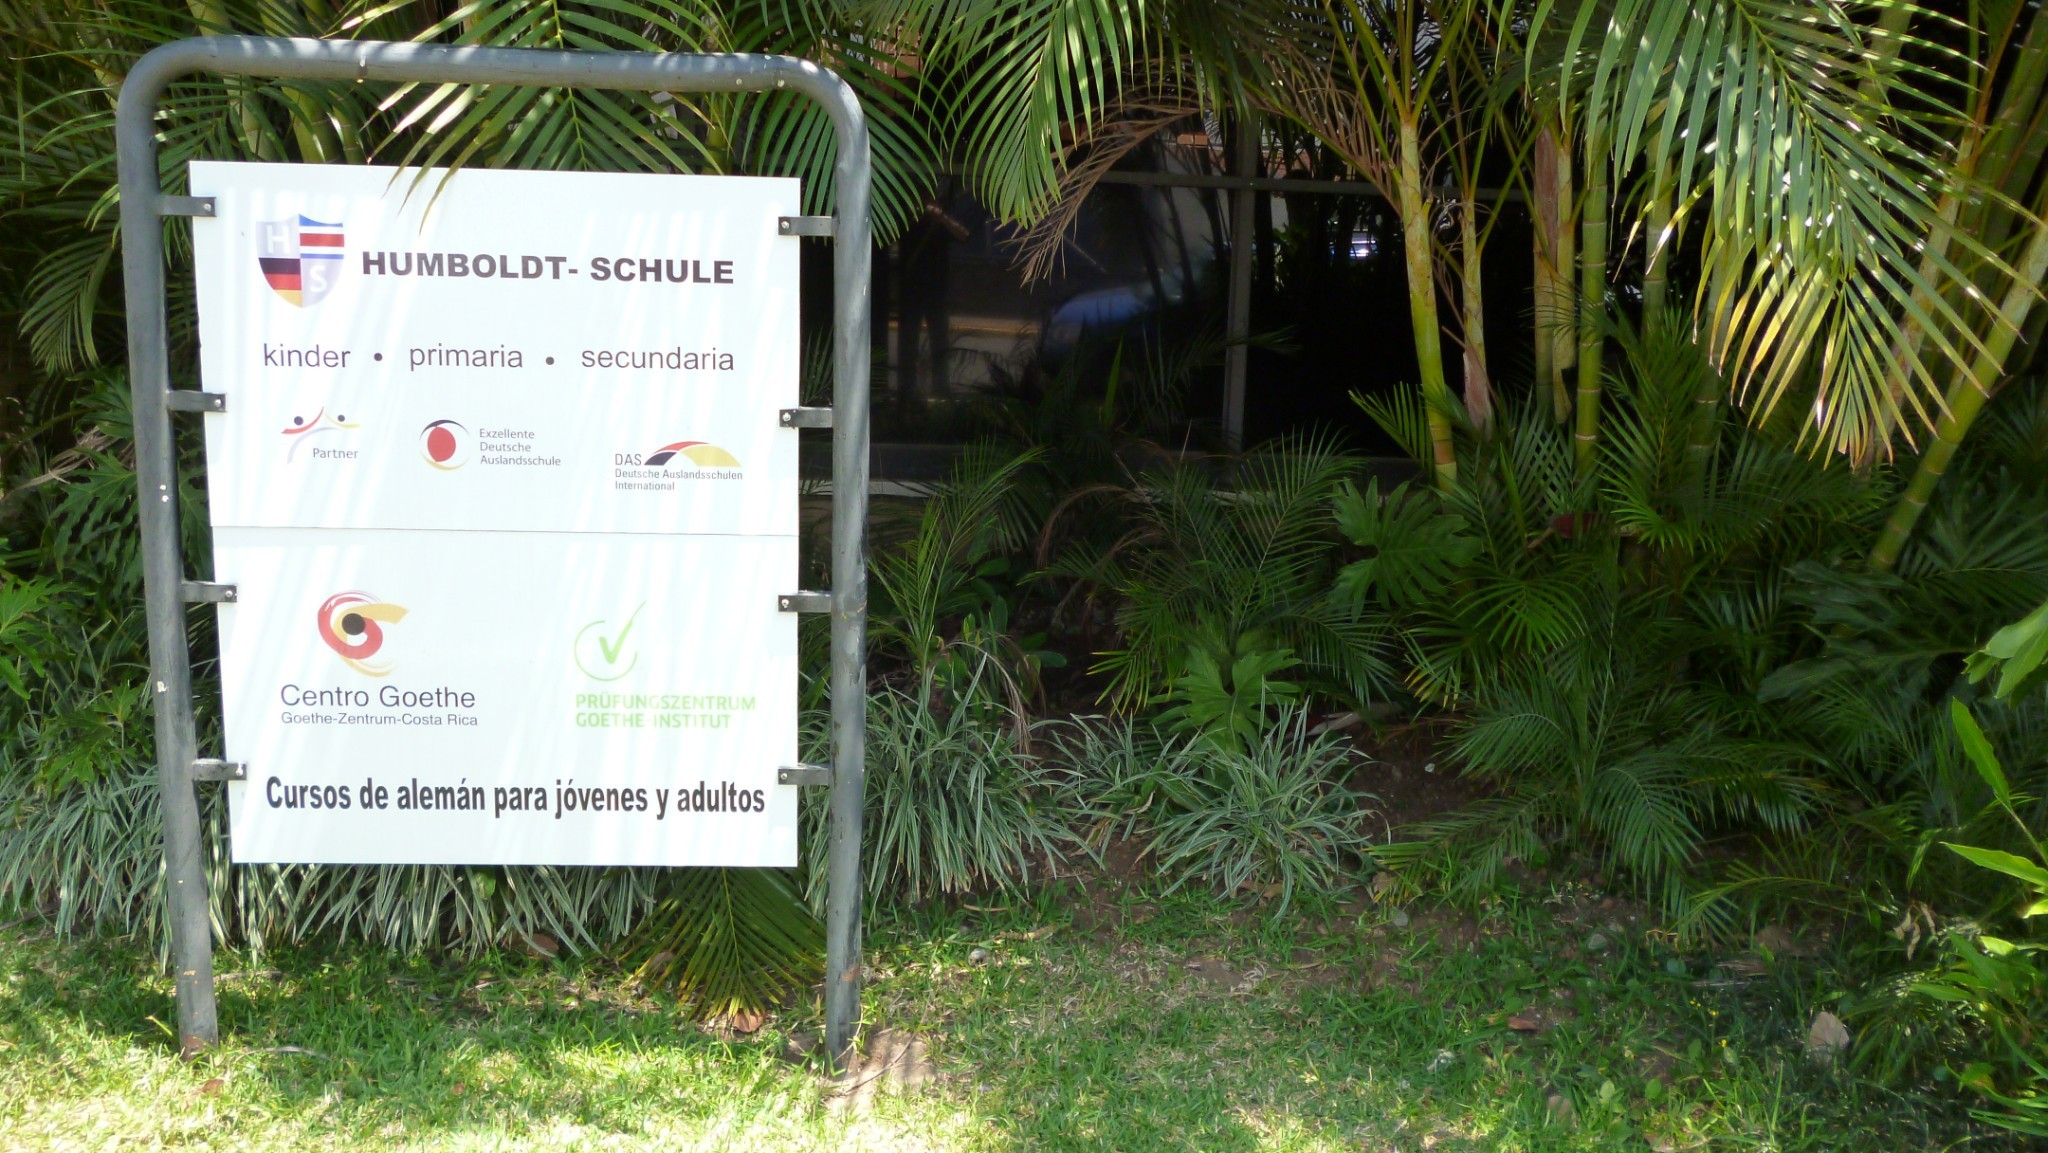 Calendario 2019 Para Imprimir Costa Rica Más Recientes Galera – Centro Goethe Of Calendario 2019 Para Imprimir Costa Rica Más Actual Calendario A±o 2019